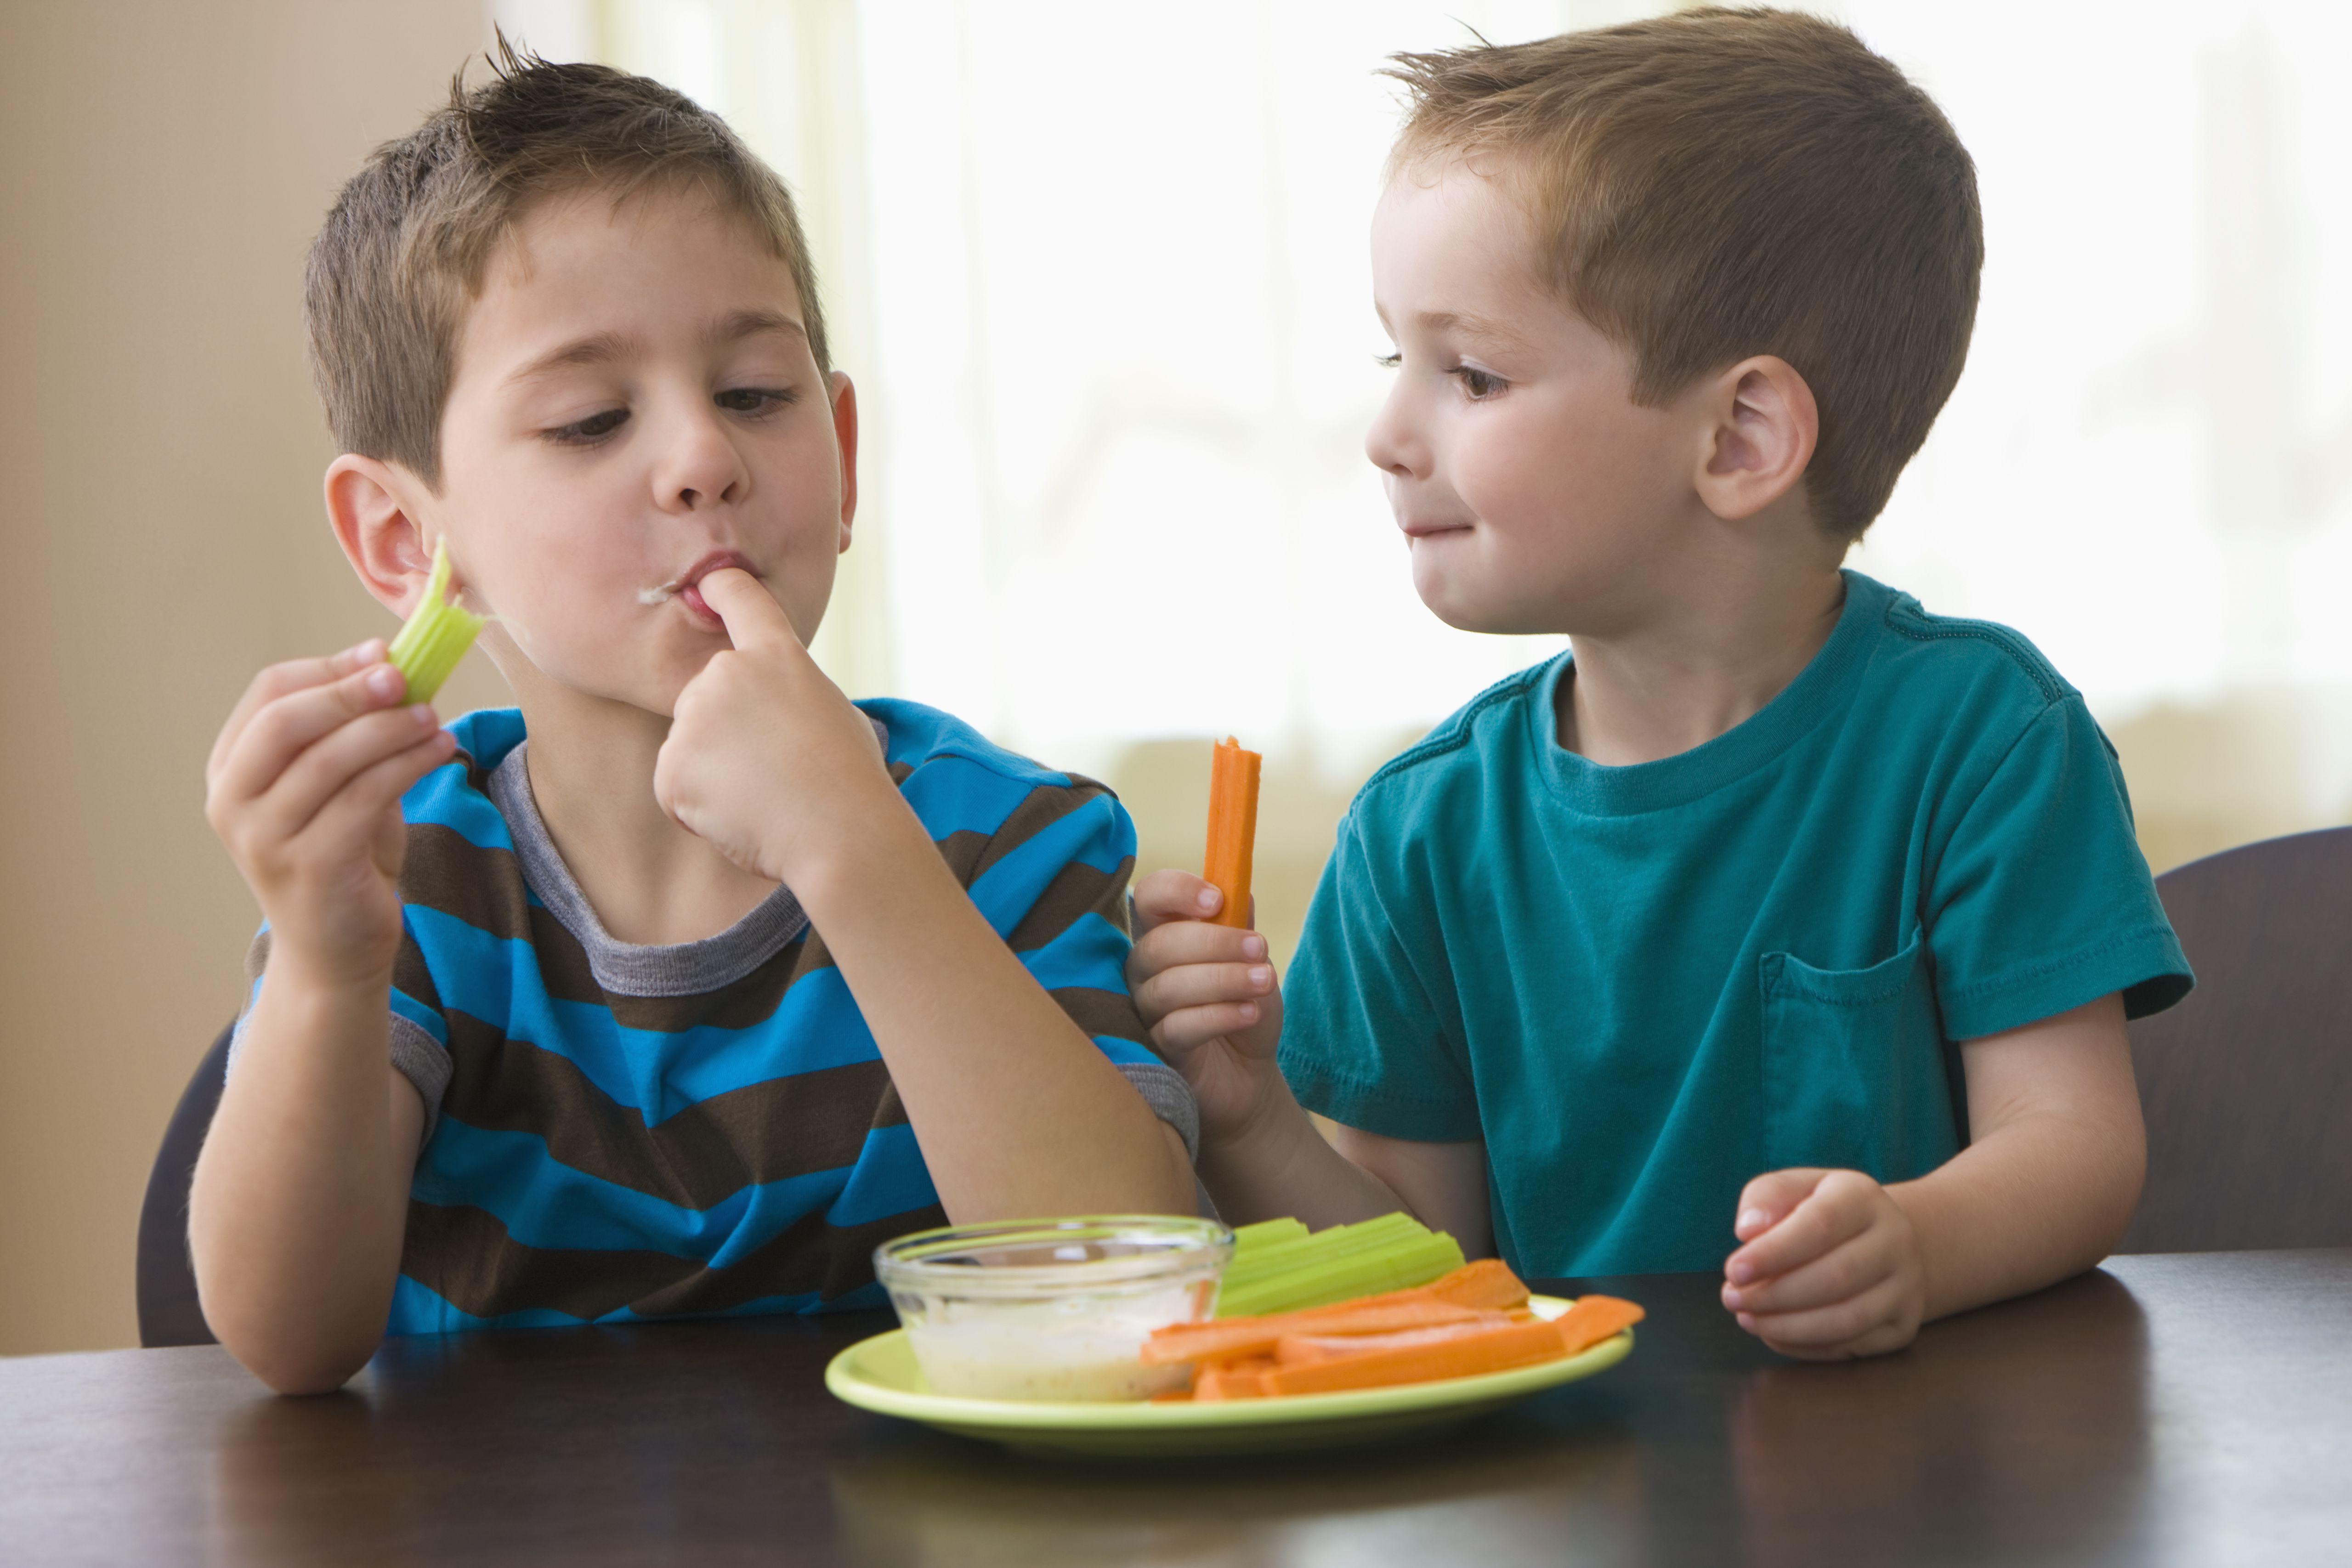 Two boys dipping veggies